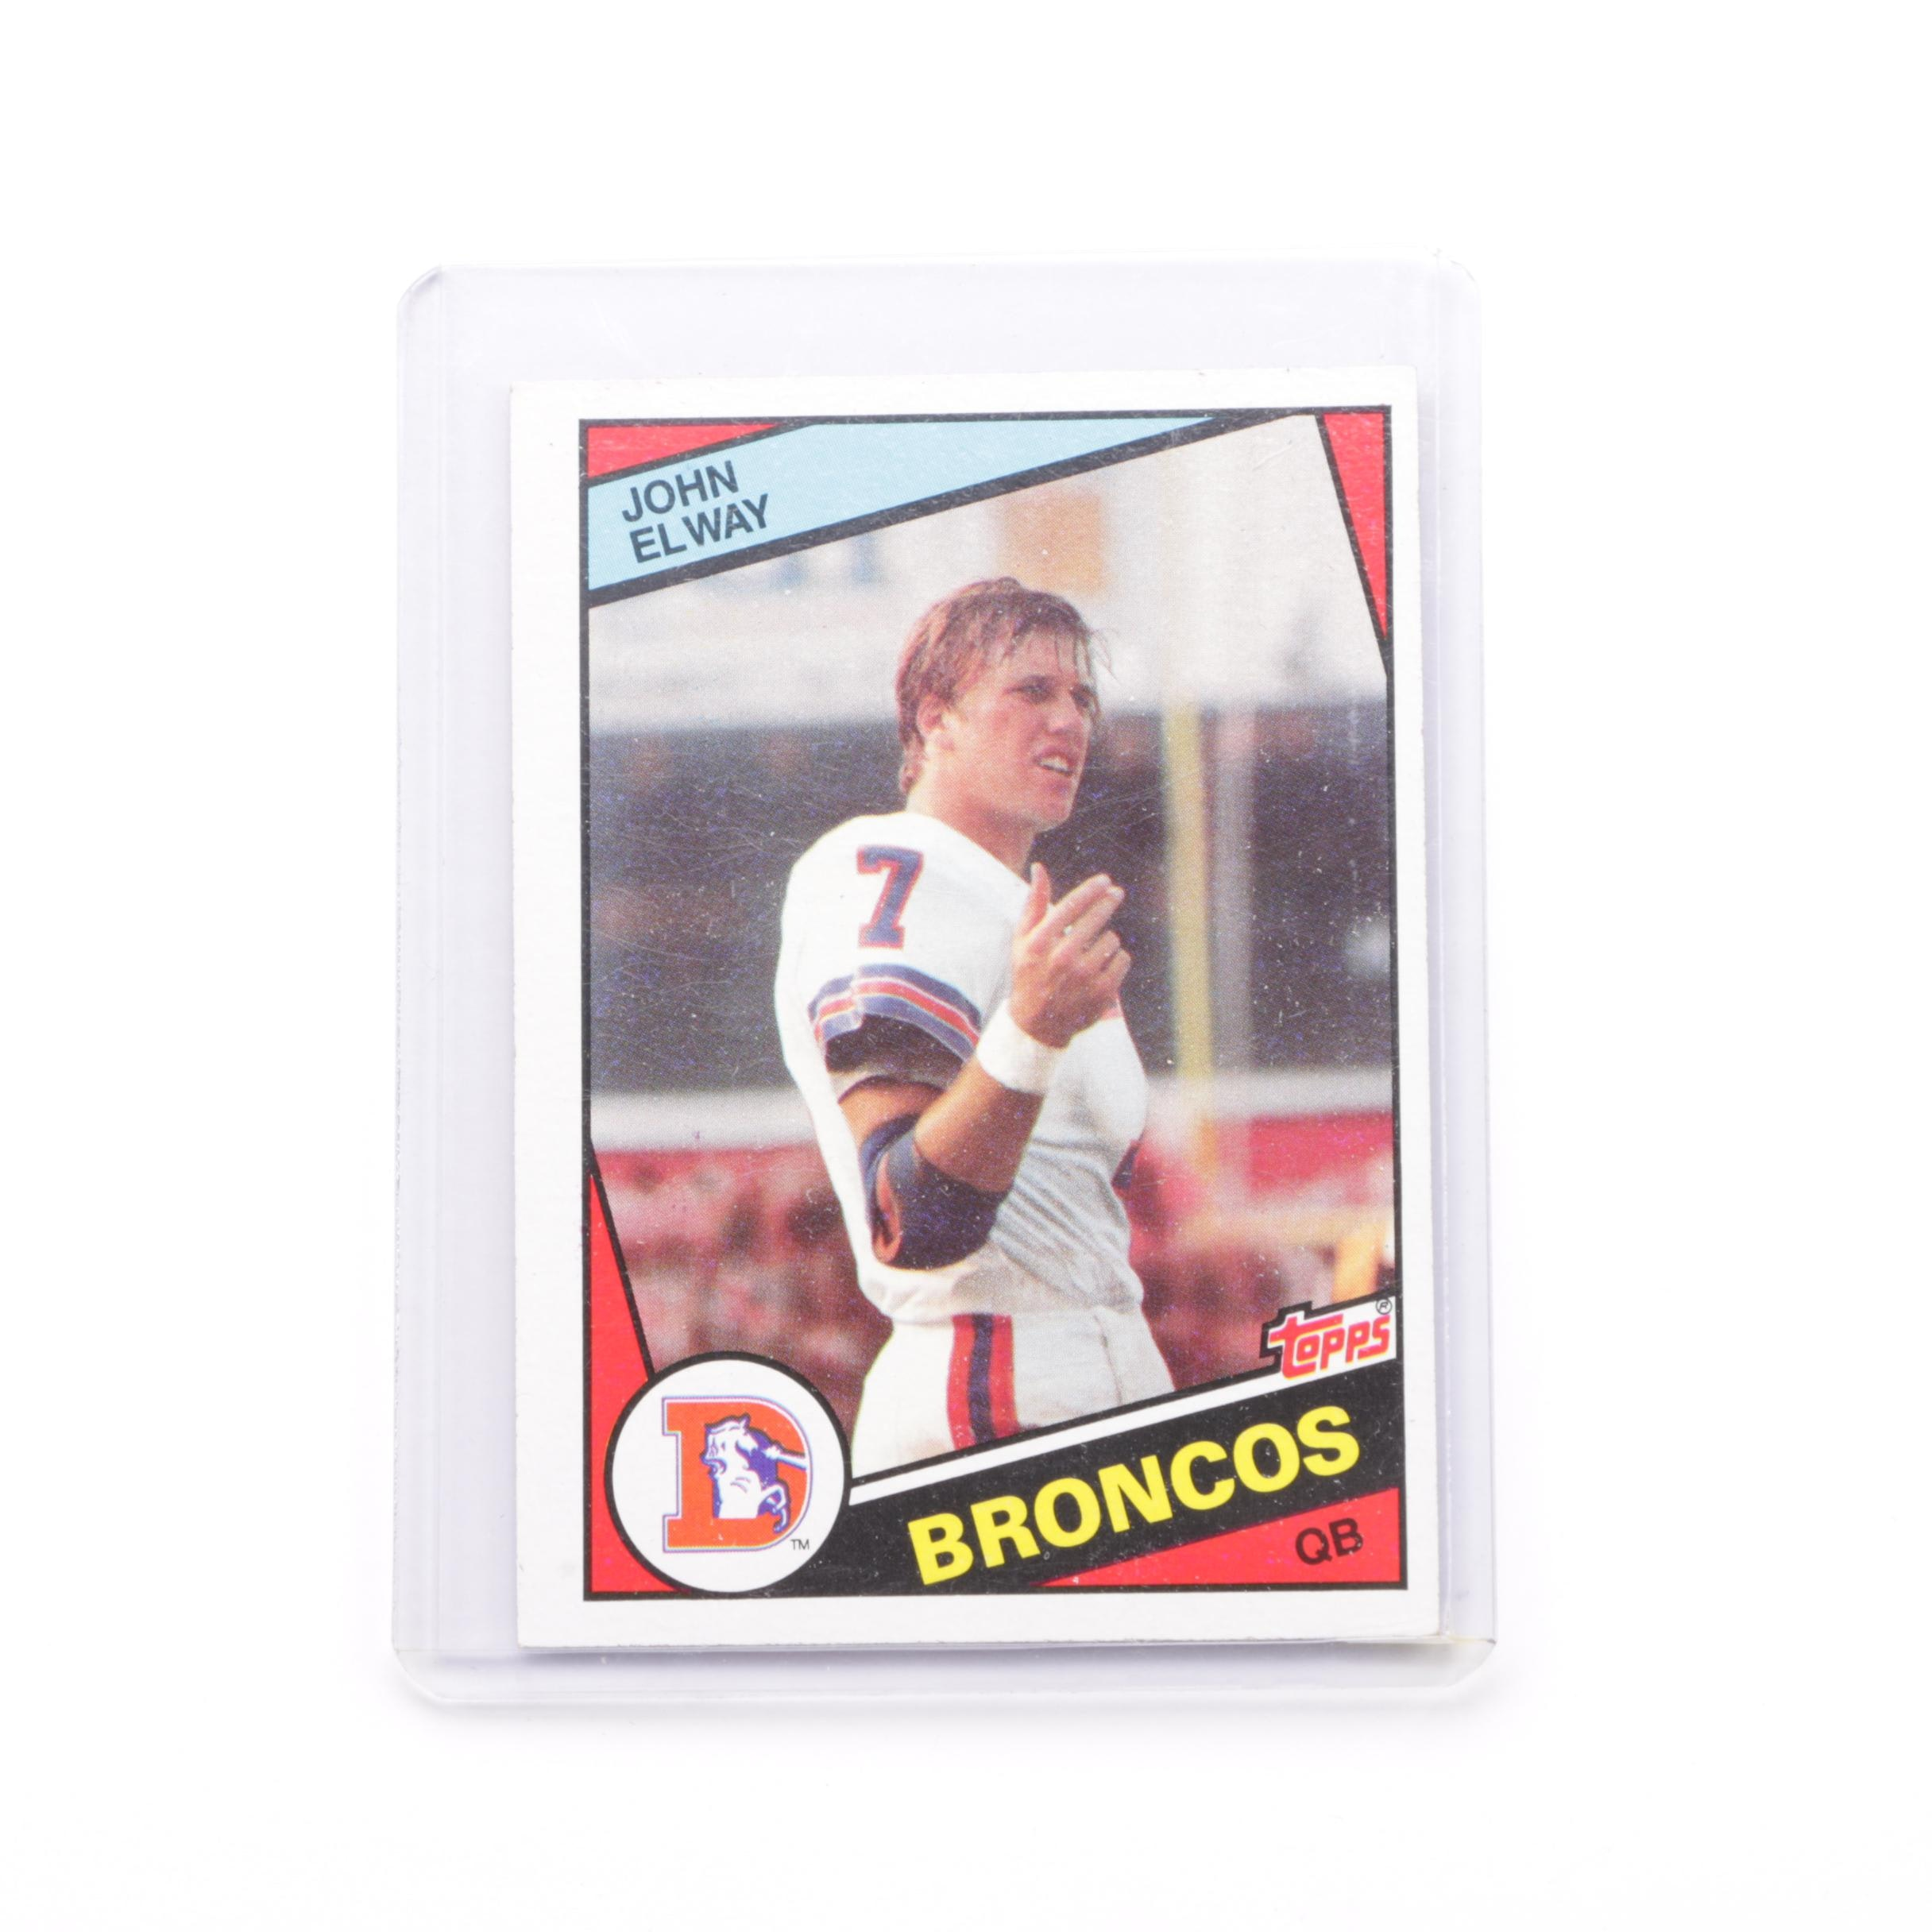 1984 Topps 63 John Elway Football Card